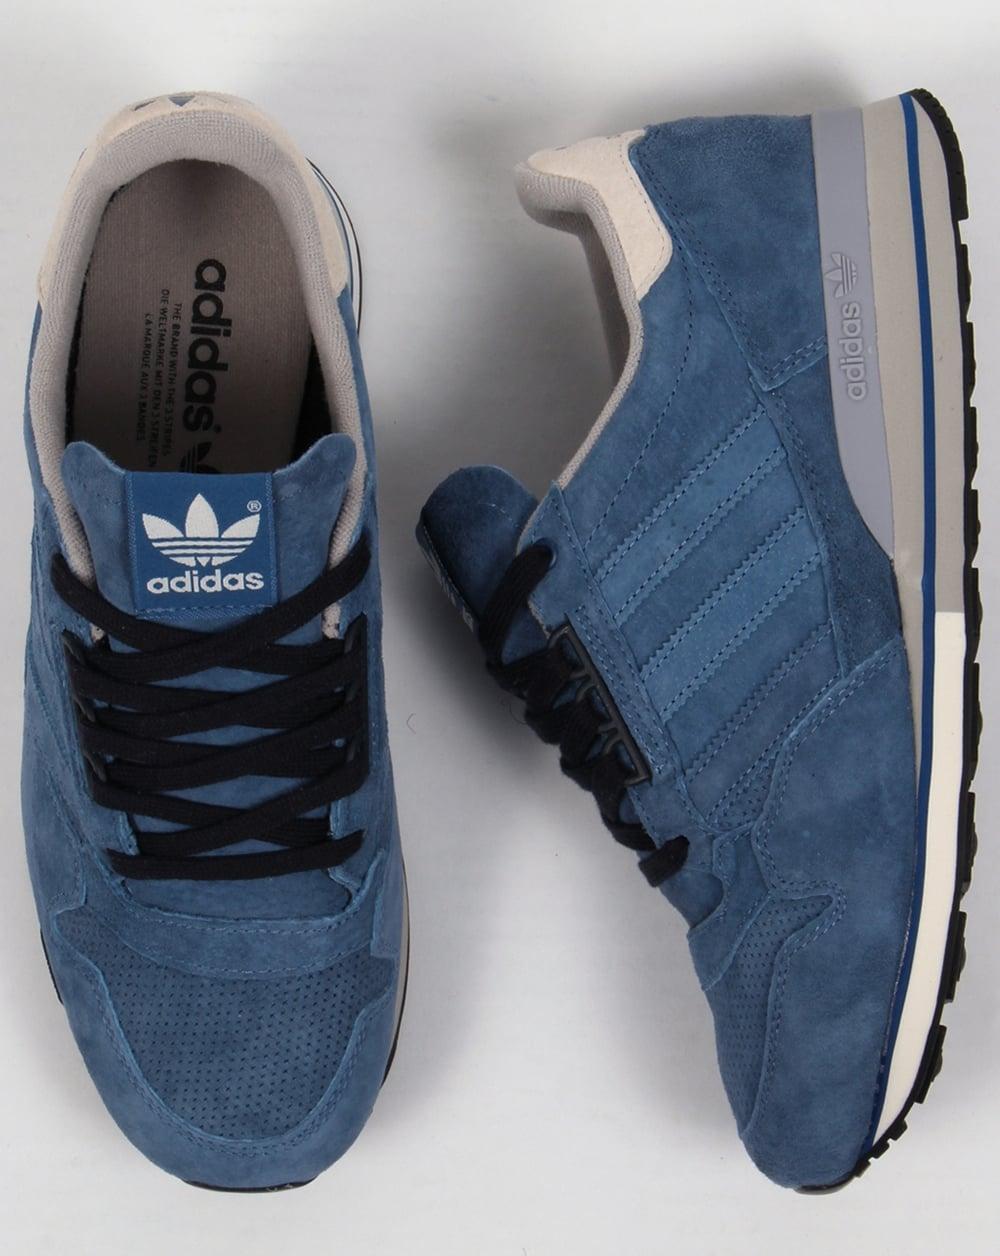 Adidas Zx 500 Blu Zklu2kLQg